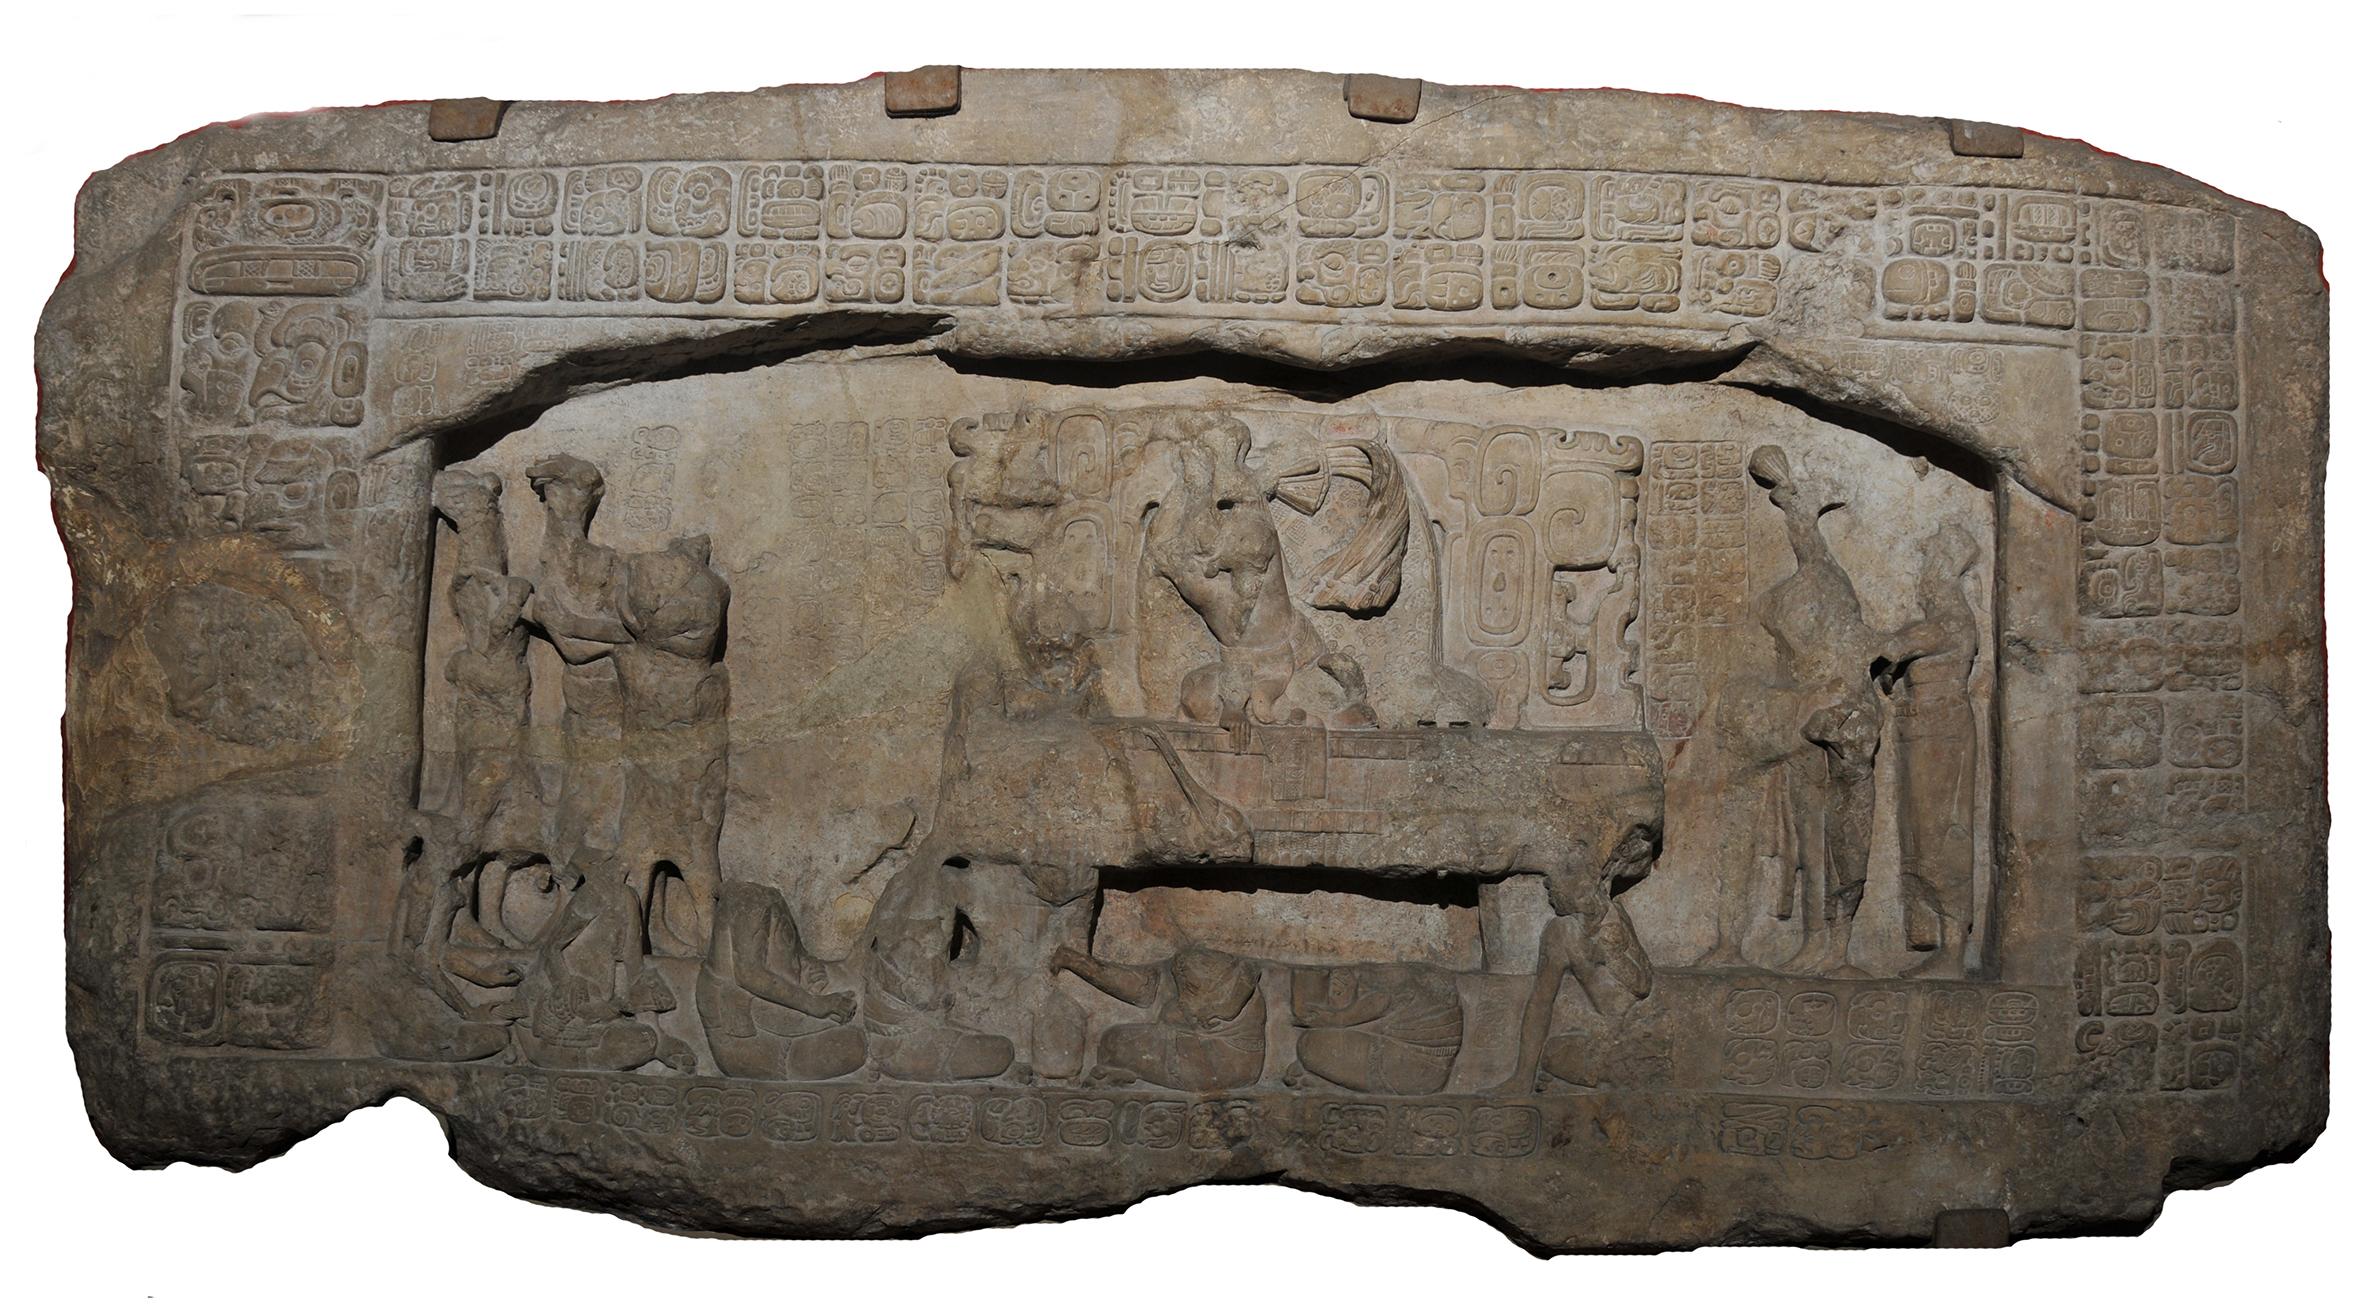 И еще комиксов на тему древних майя PNG_Lnt-3a